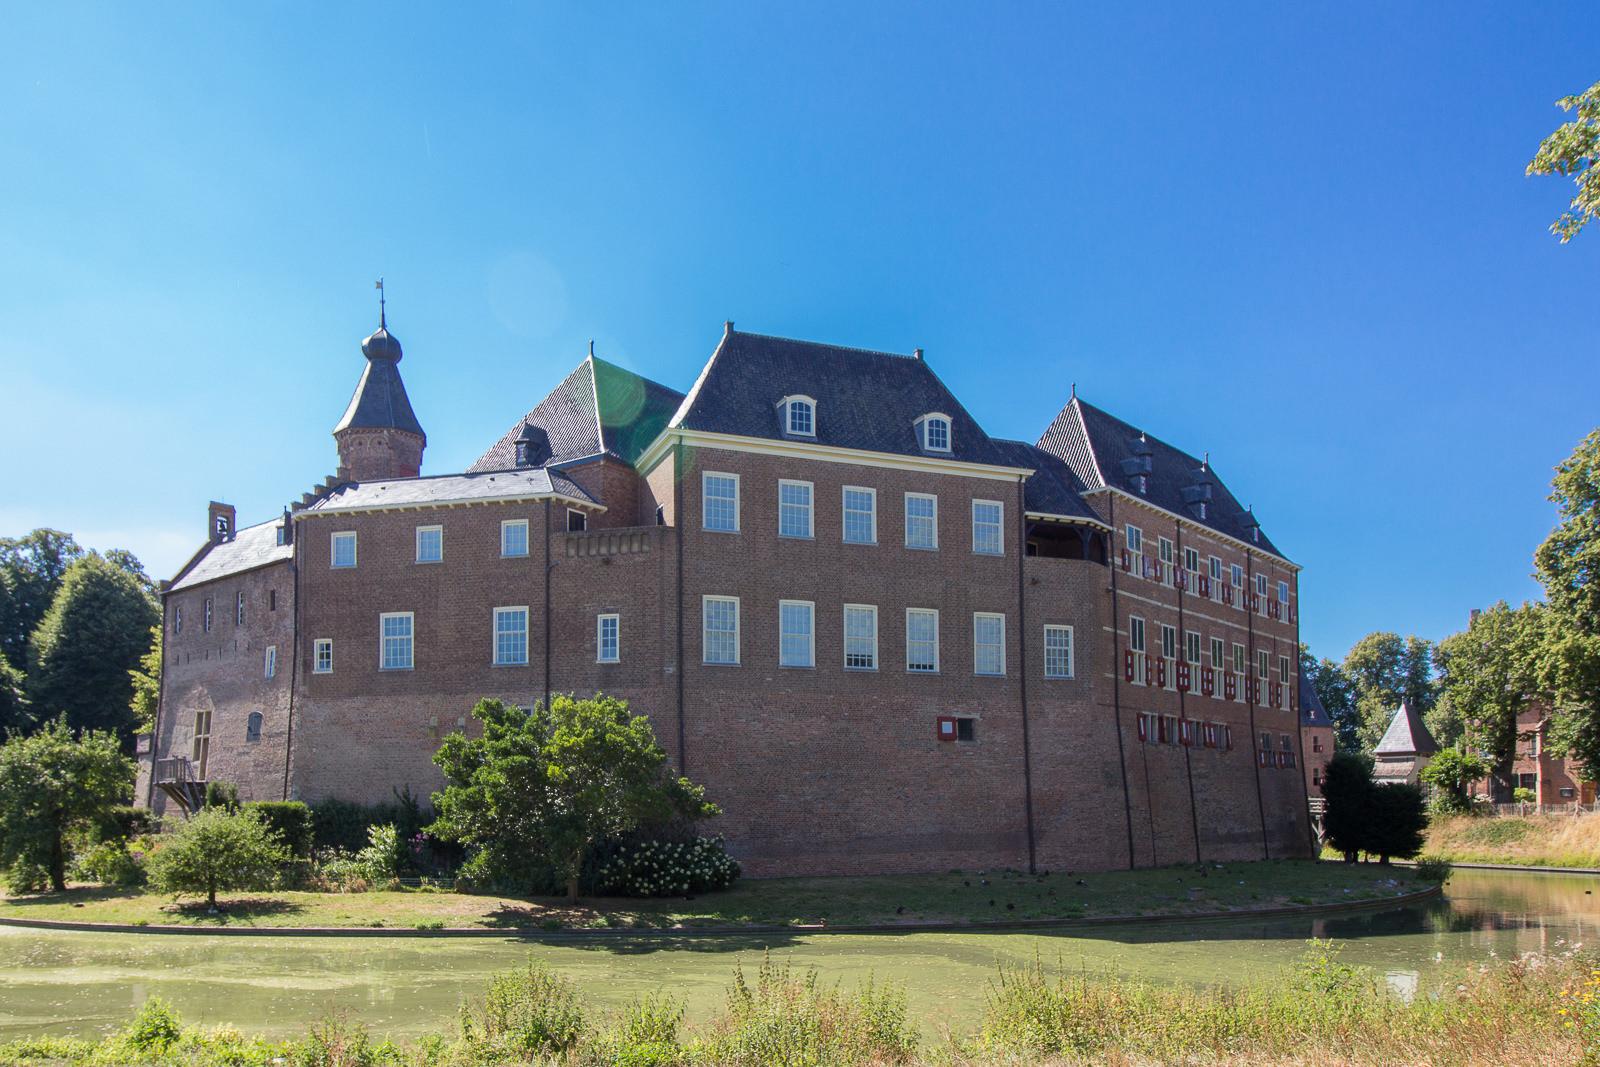 Kastell Schloss Huis Berg, 's-Heerenberg